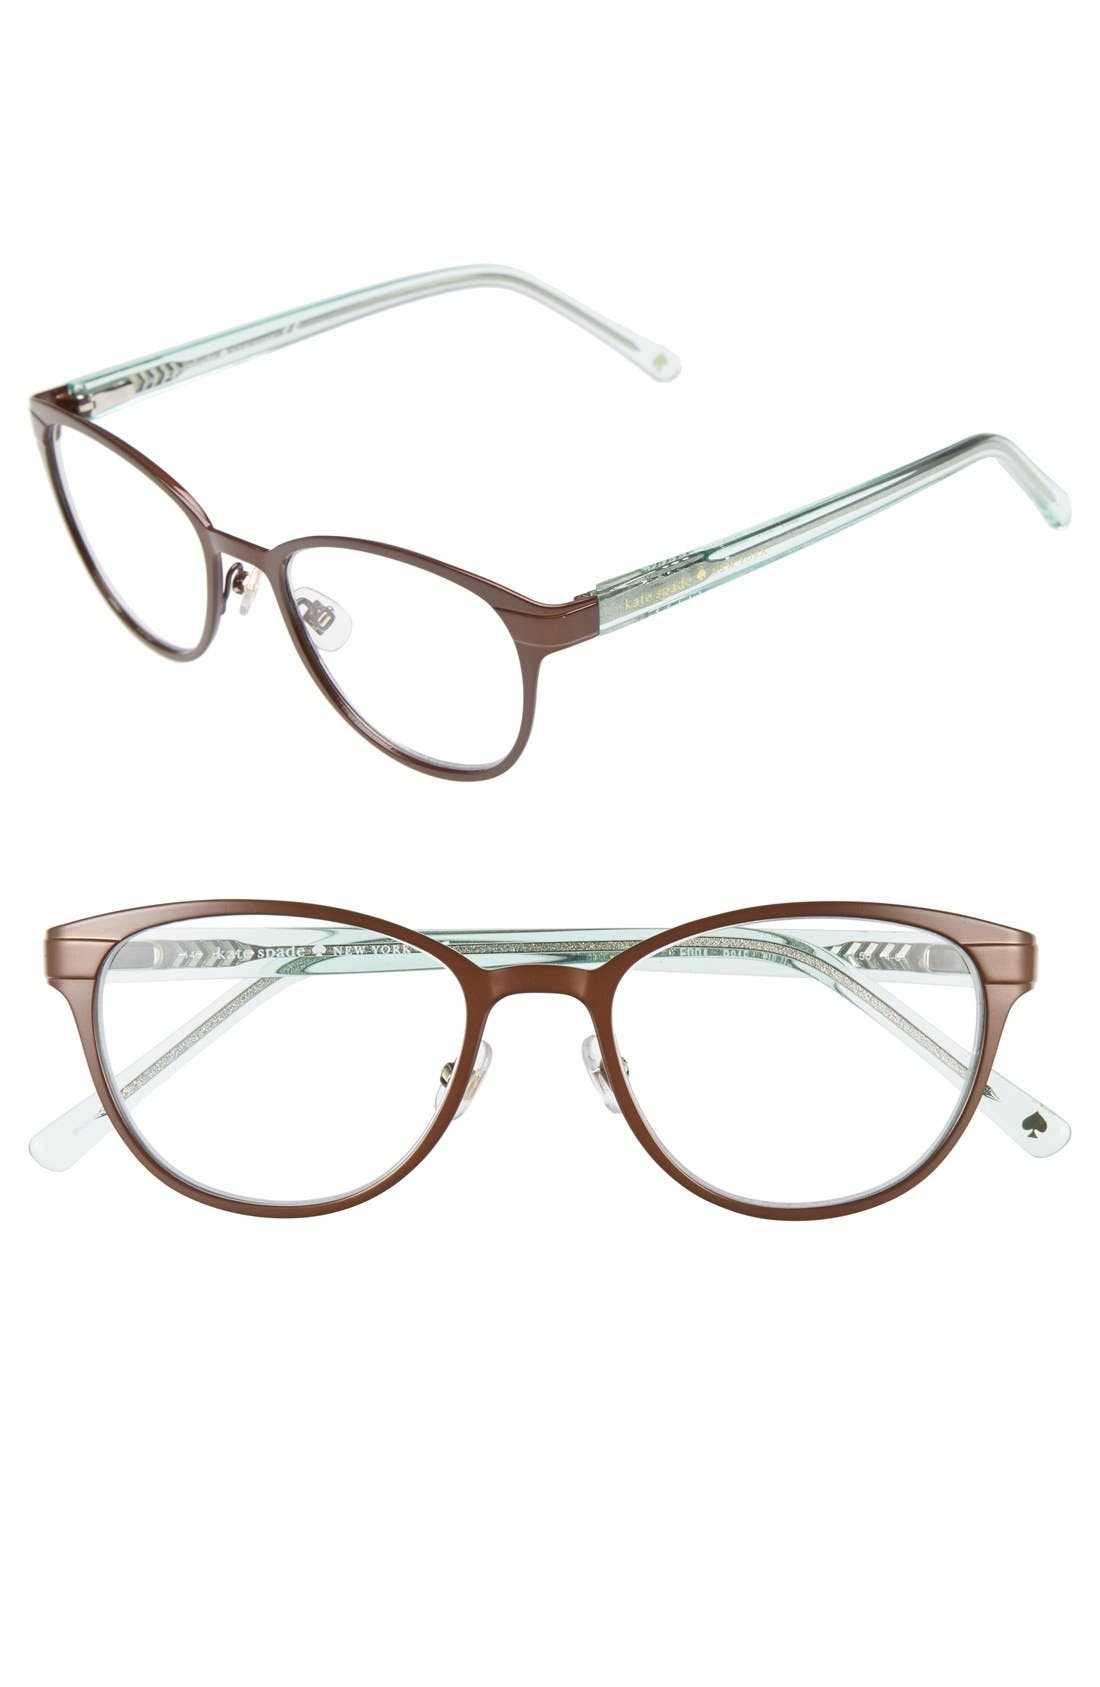 Alternate Image 1 Selected - kate spade new york 'ebba' 50mm reading glasses